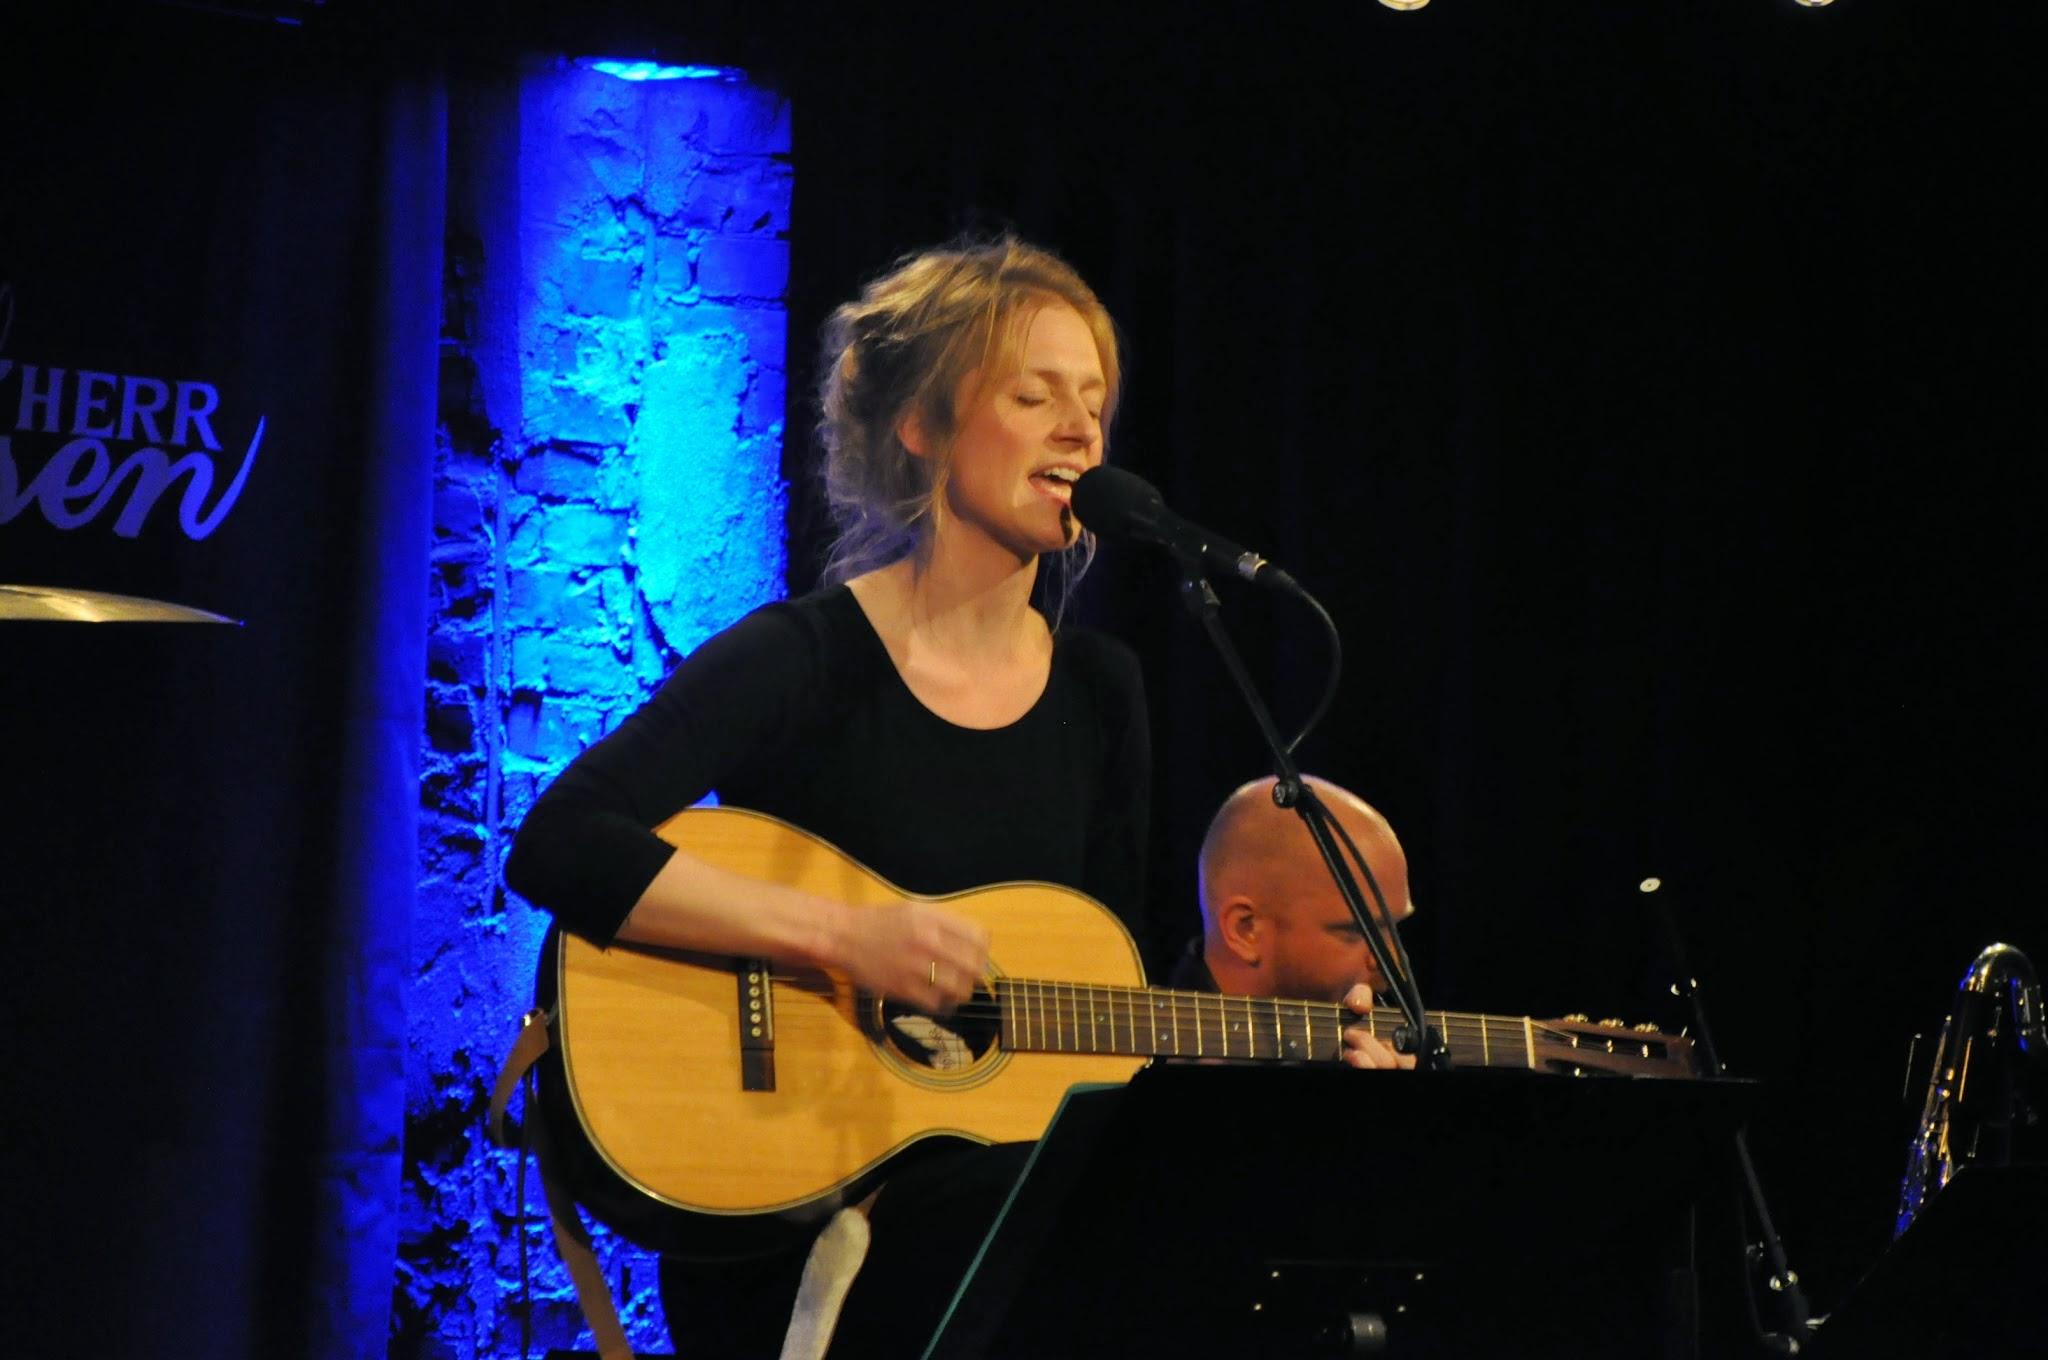 Ellen-Sofie-Hovland-1_Foto-Guri-Rønning.jpg